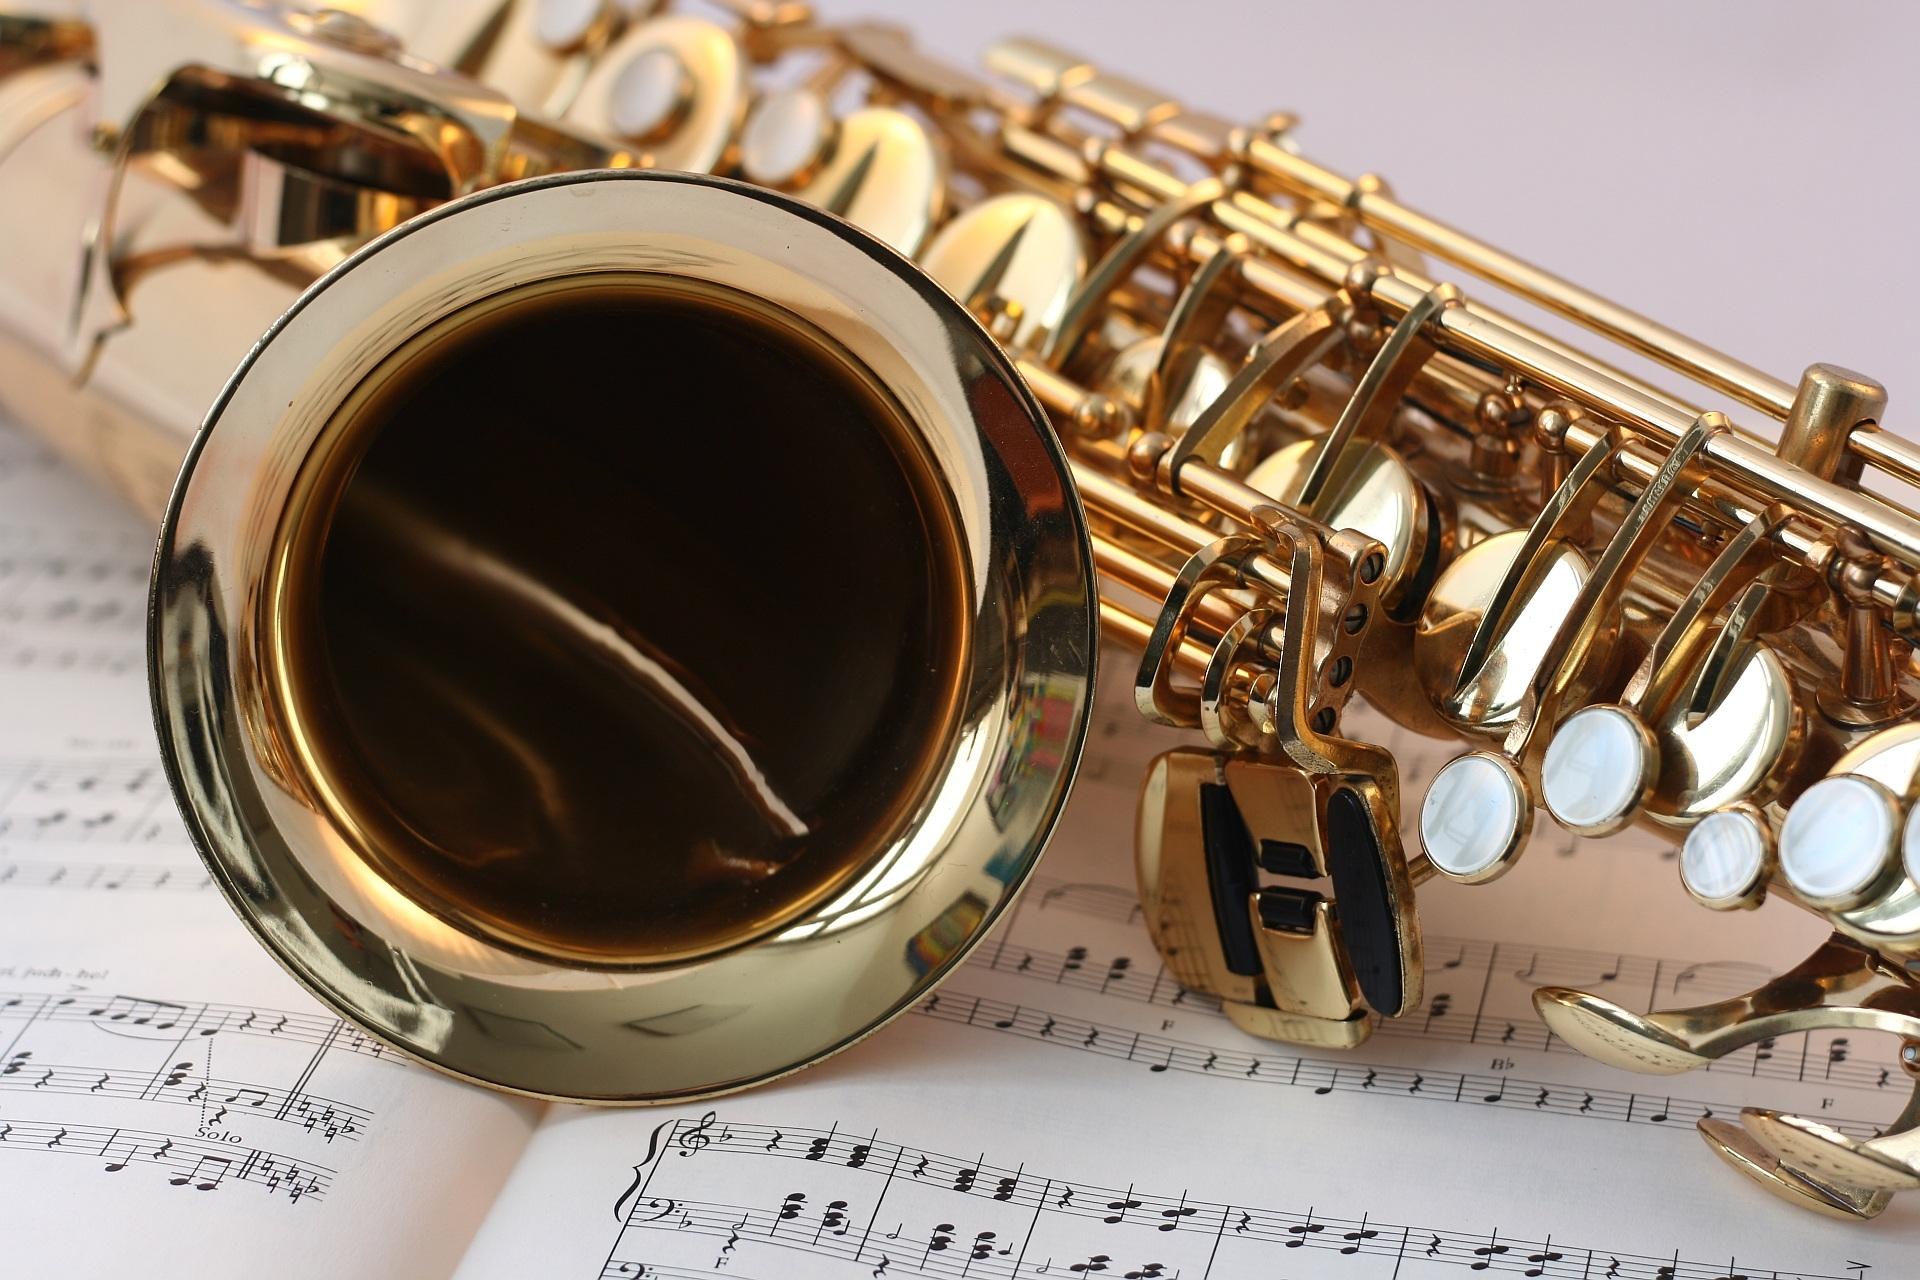 saxophone-music-gold-gloss-45243.jpeg